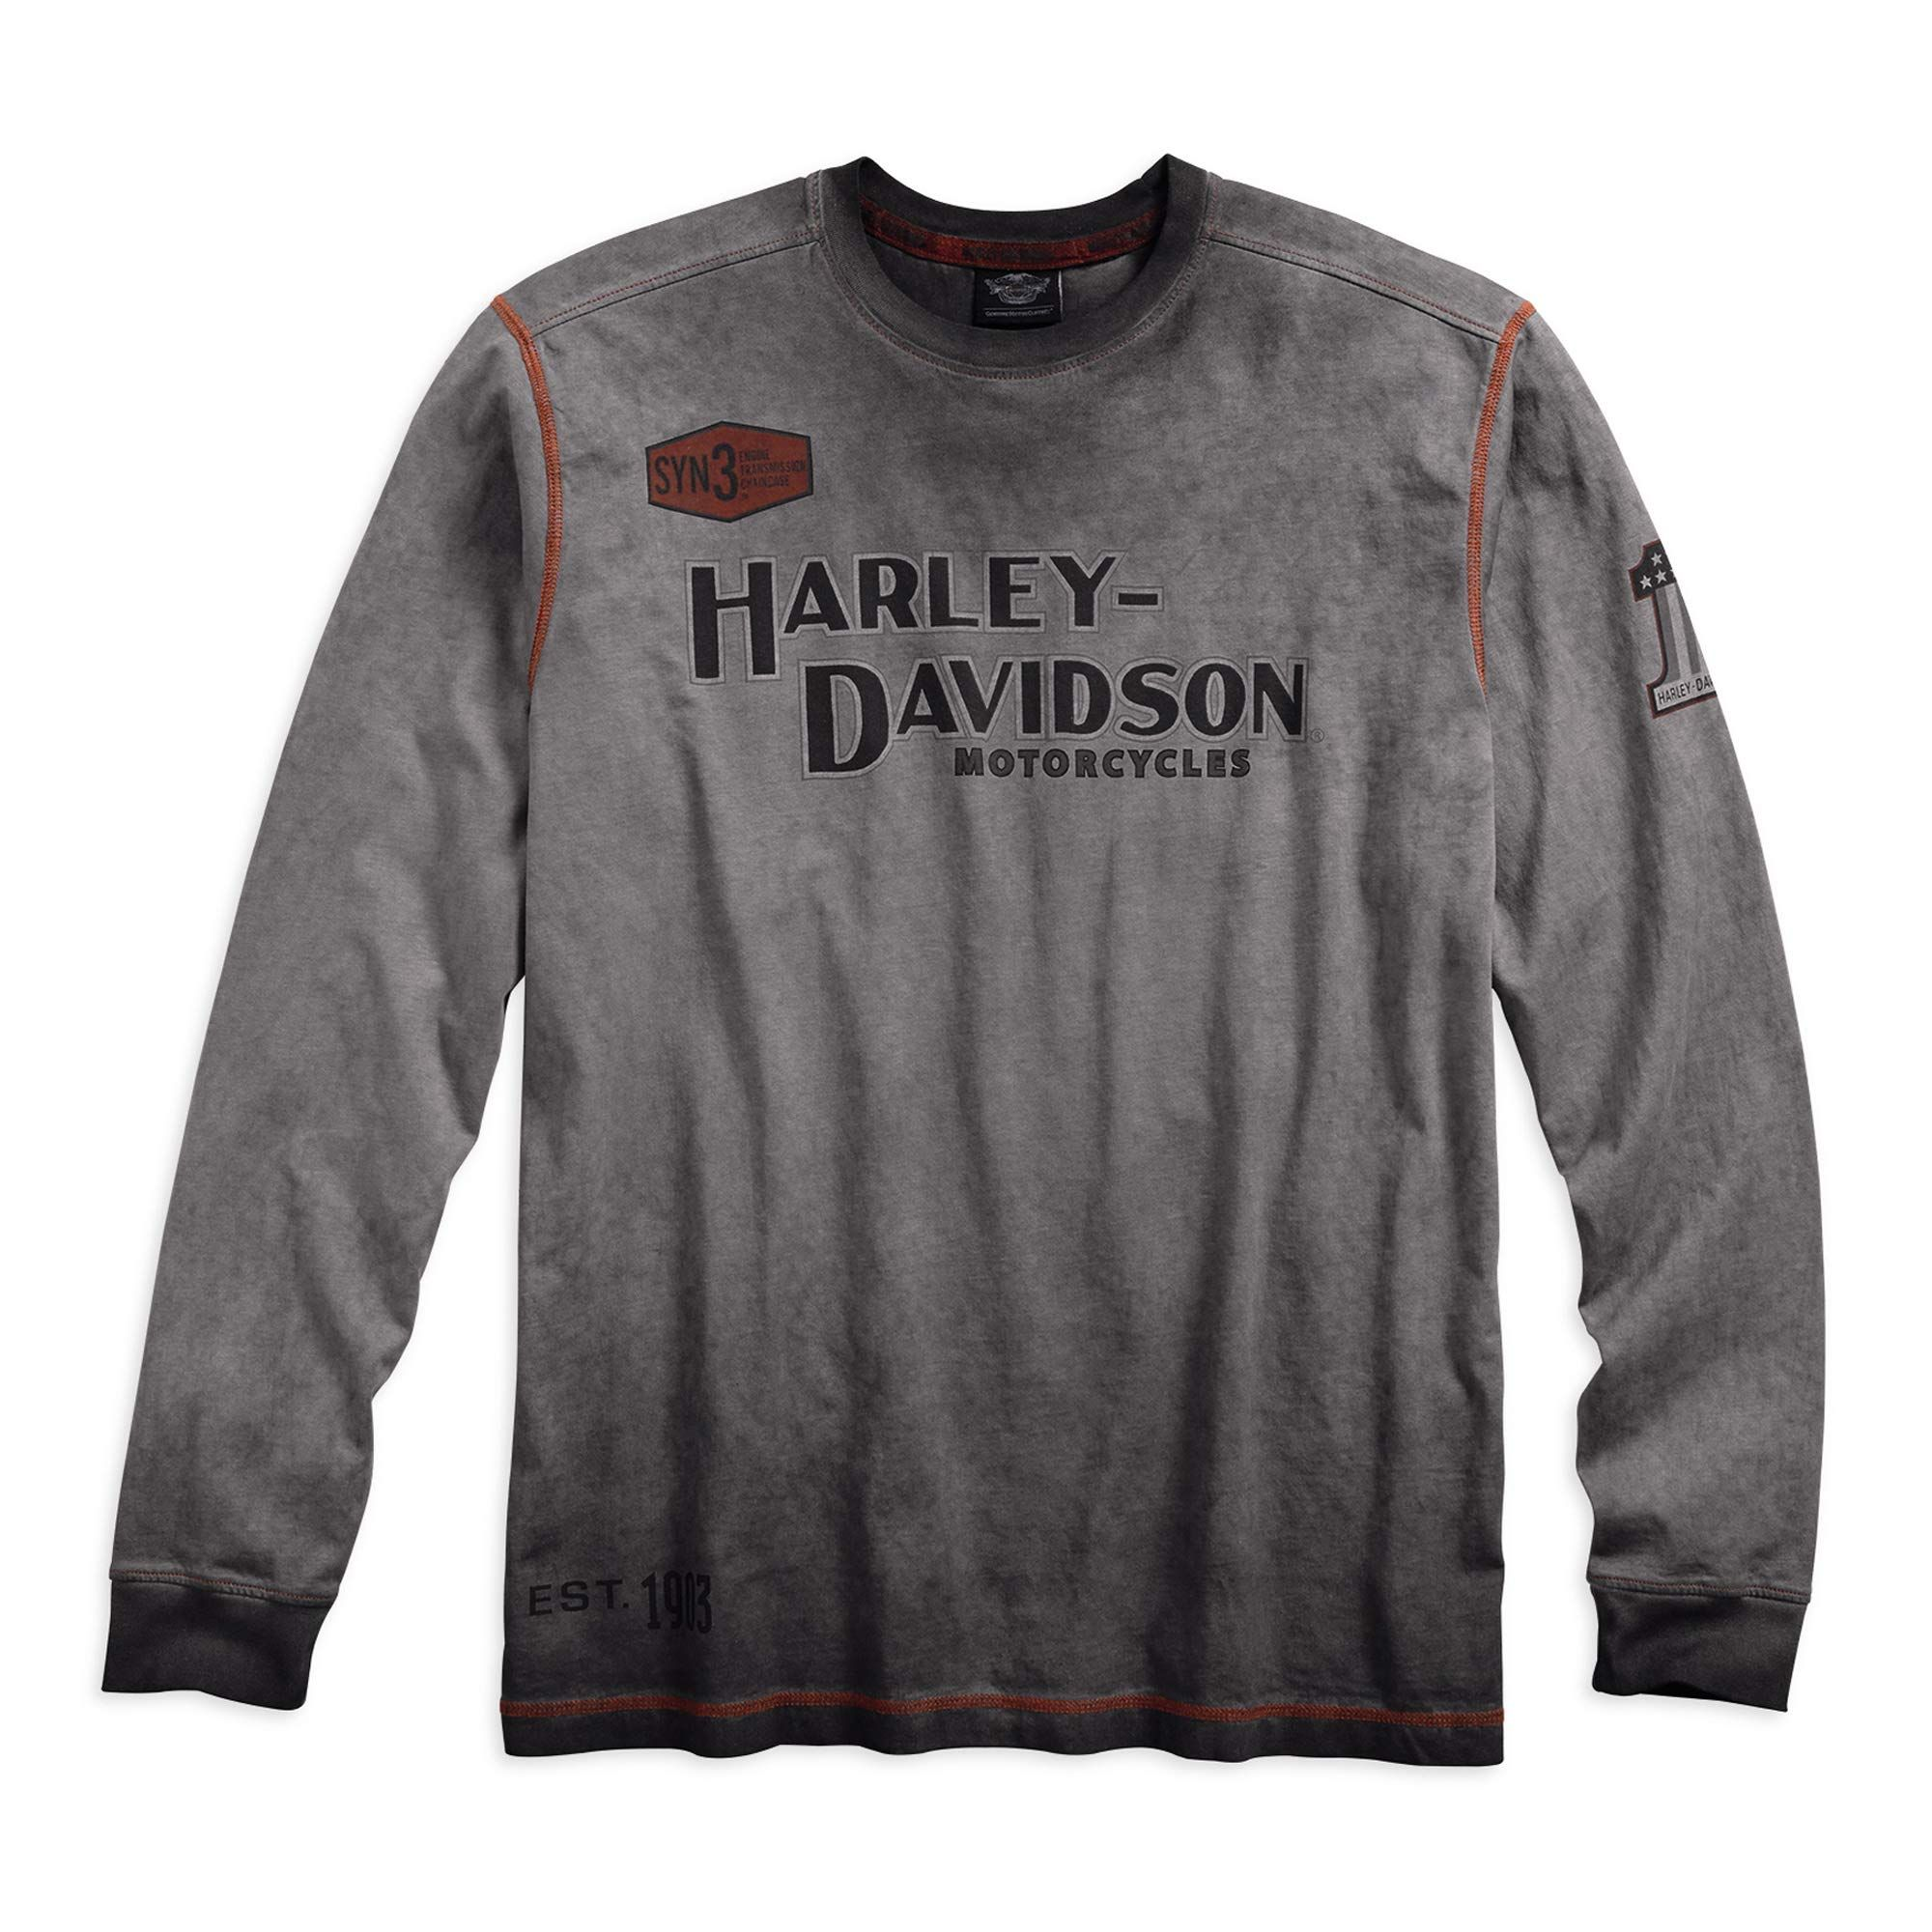 Harley Davidson Official Mens Iron Block Long Sleeve Tee Grey With Images Long Sleeve Shirt Men Long Sleeve Tshirt Men Men Shirt Style